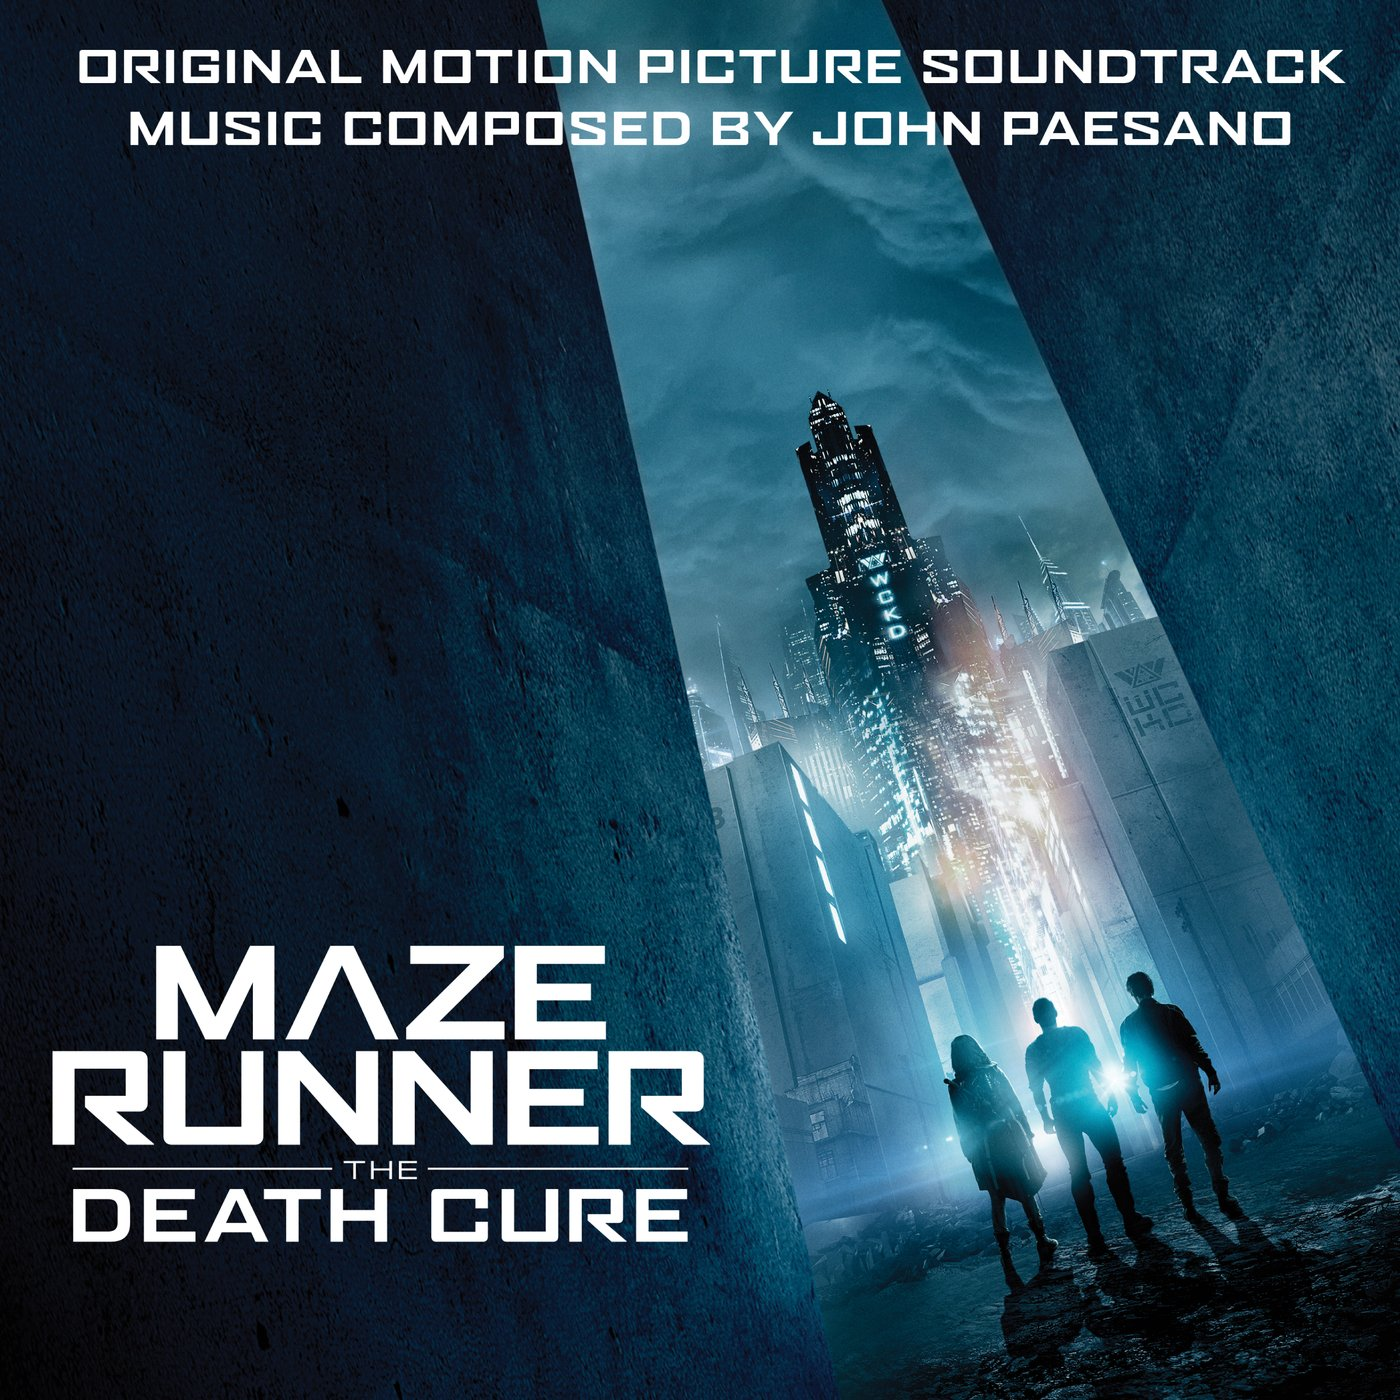 bande originale soundtrack ost score labyrinthe remède mortel maze runner death cure disney fox